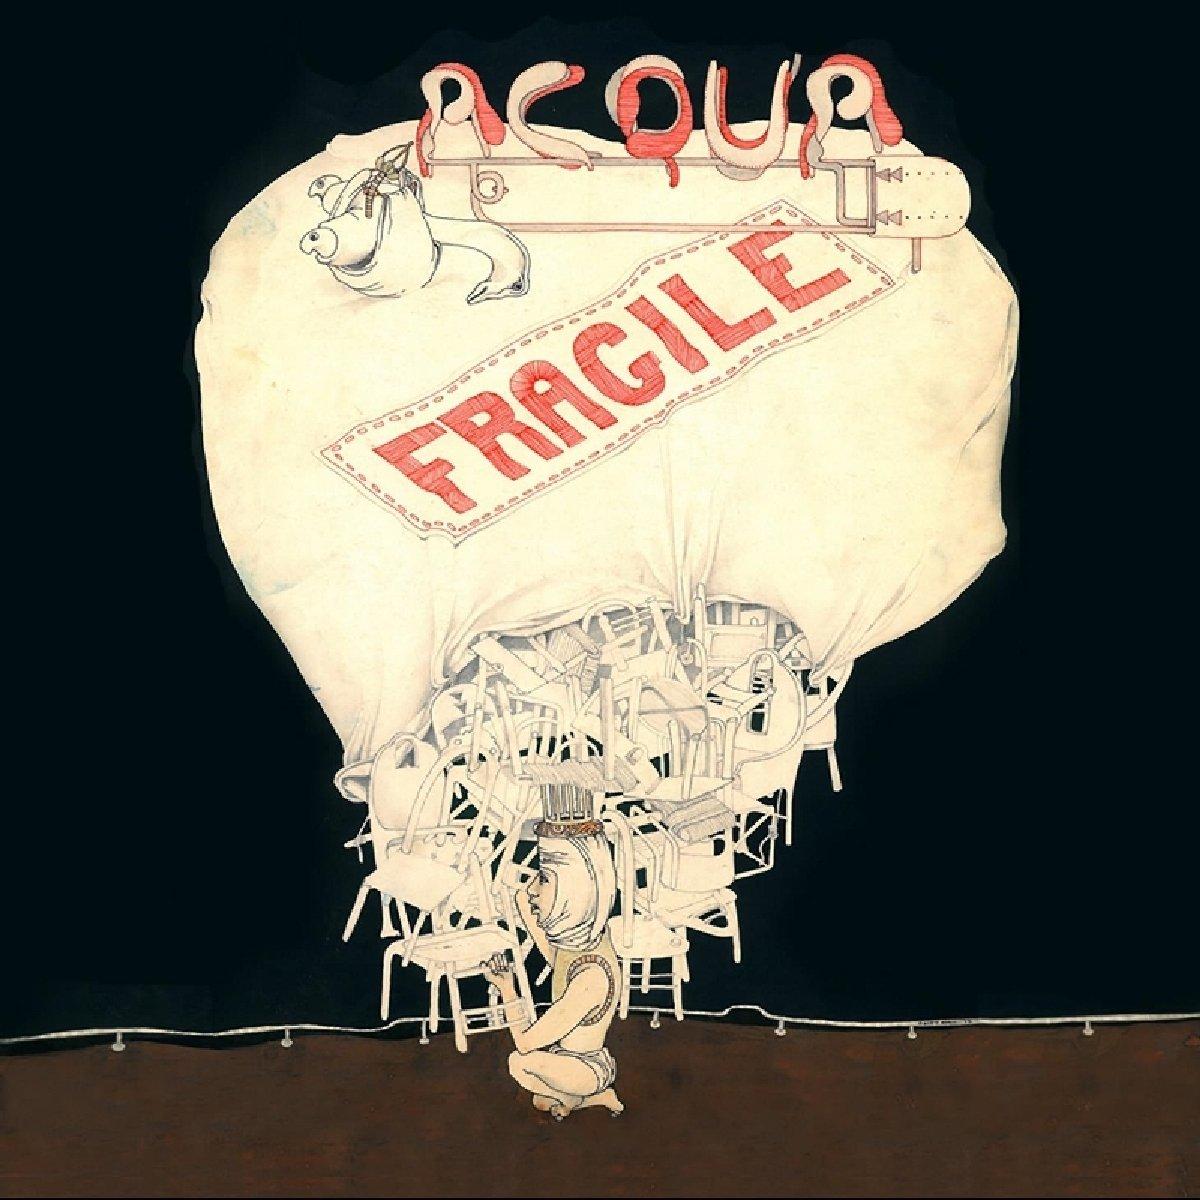 Acqua Fragile Acqua Fragile. A New Chant g chant aufer a me